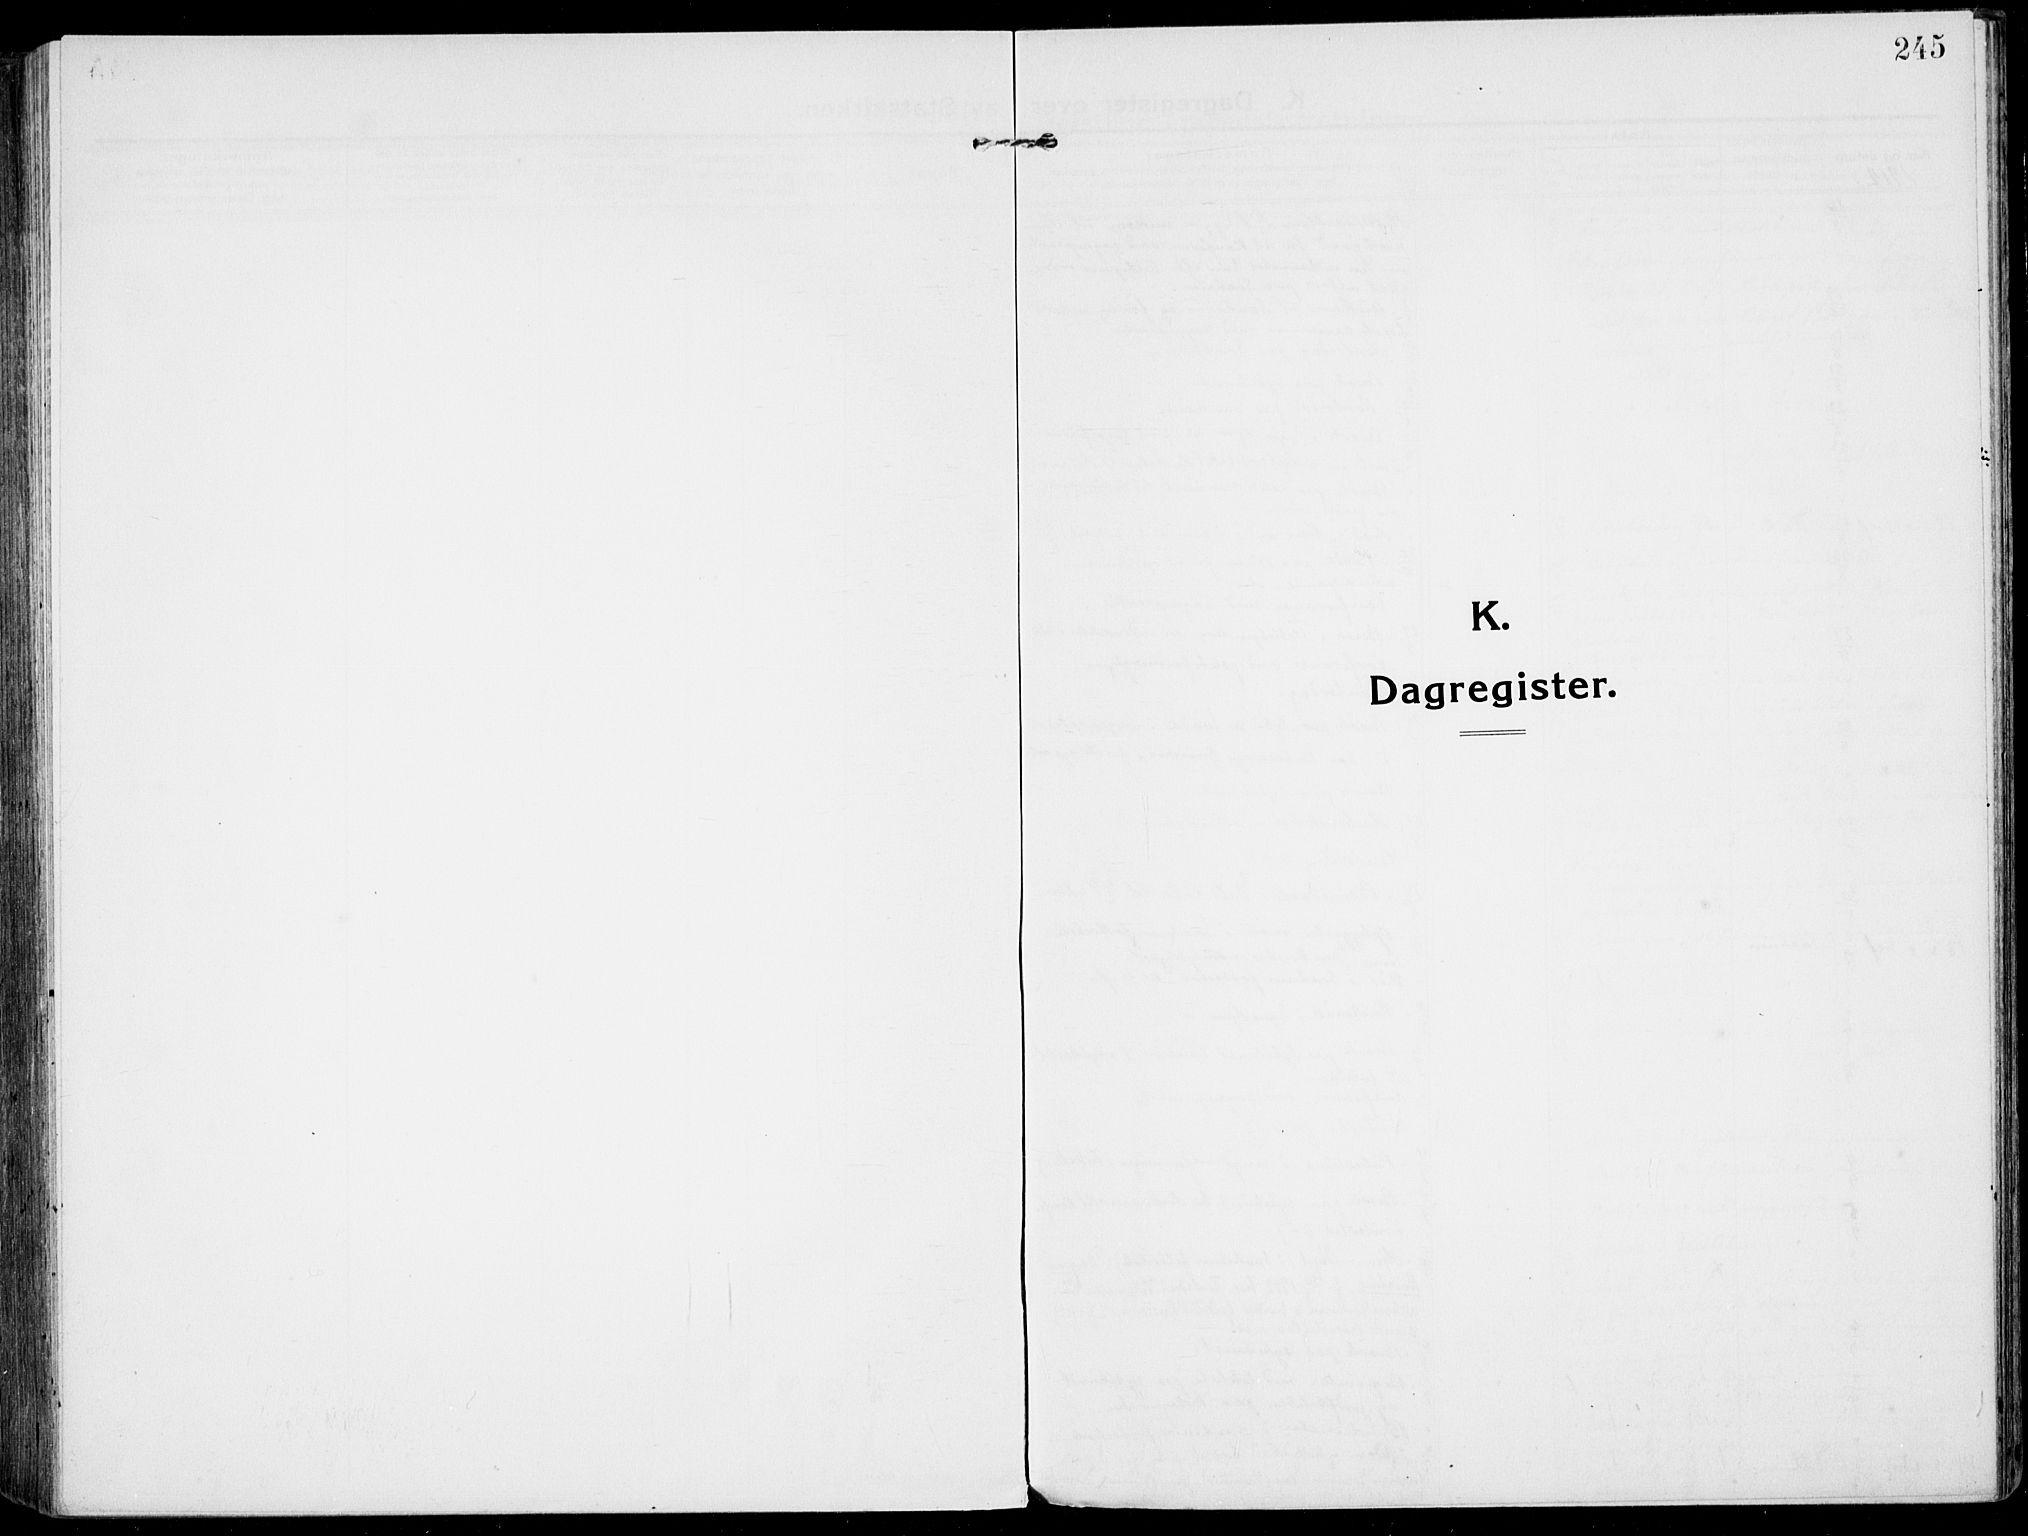 SAKO, Rjukan kirkebøker, F/Fa/L0002: Ministerialbok nr. 2, 1912-1917, s. 245